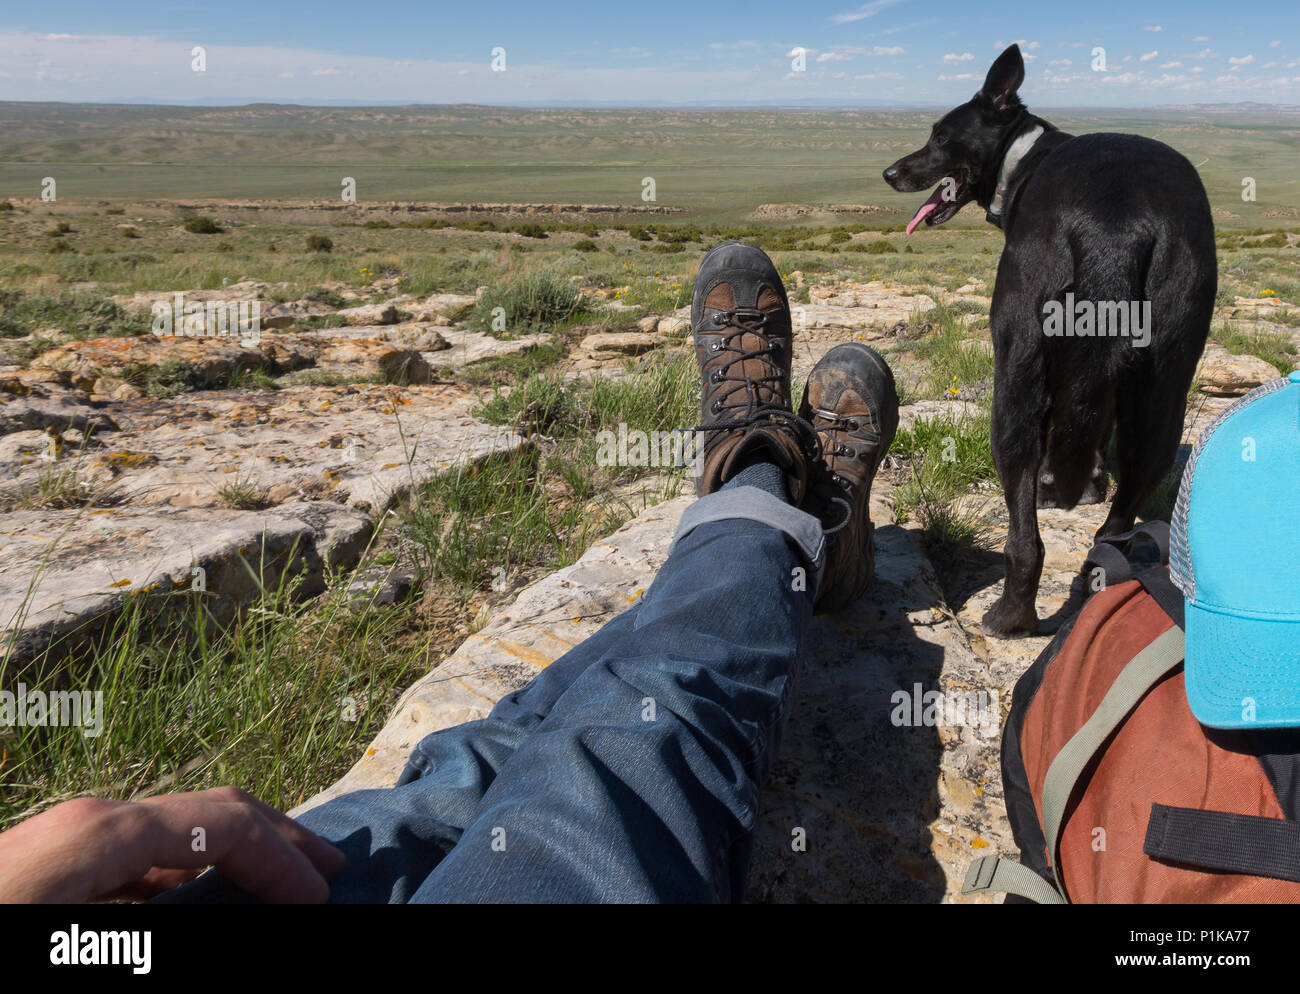 Man sitting on rocks with his dog, Wyoming, America, USA - Stock Image